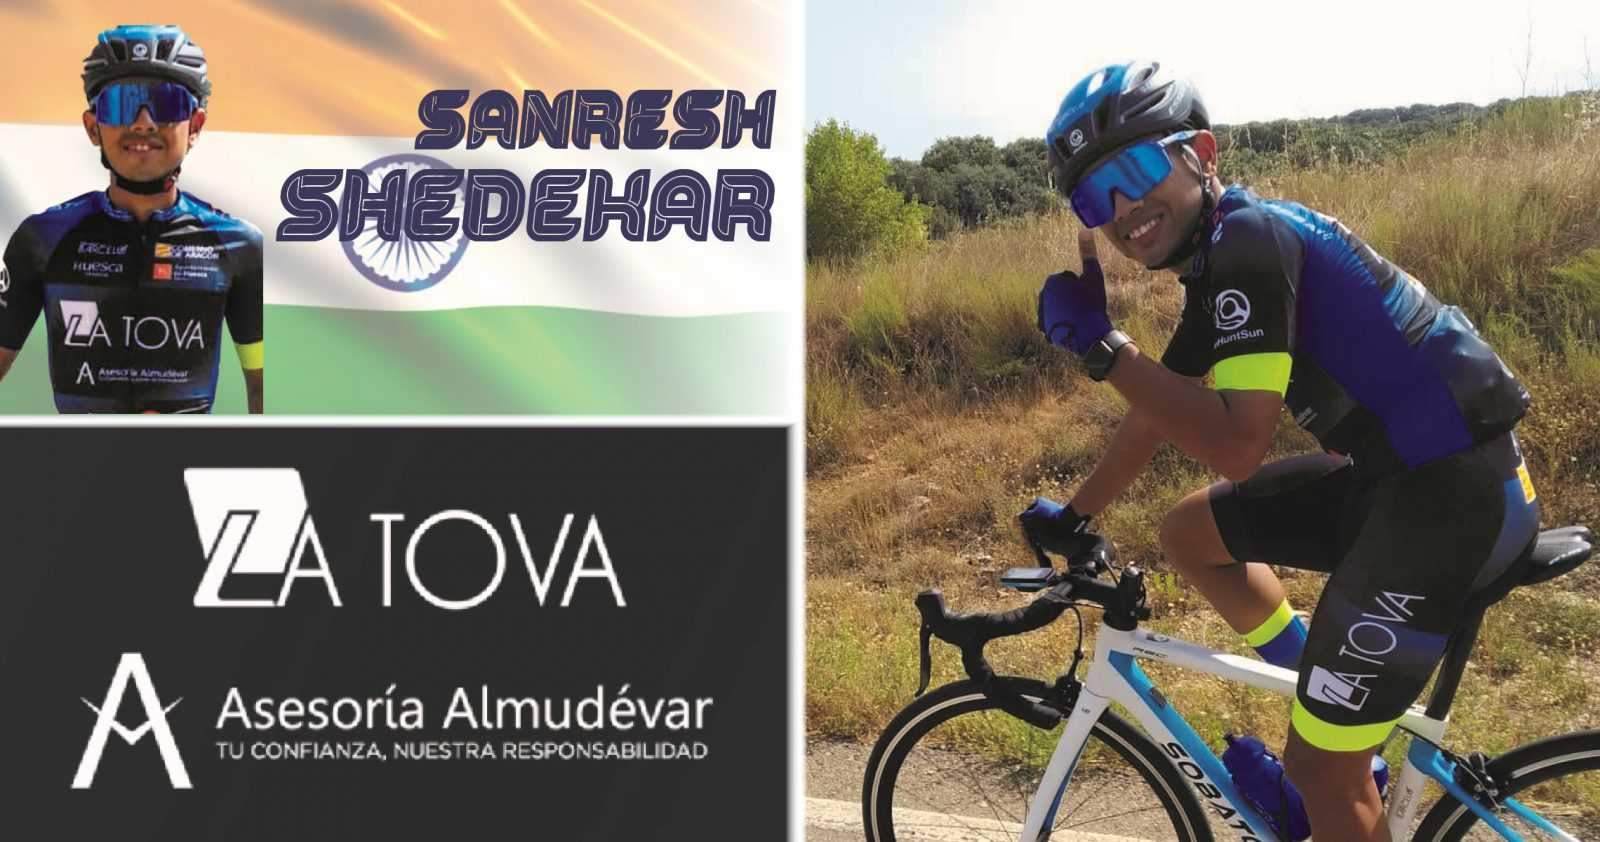 Samresh Shedekar La Tova Asesoría Almudévar